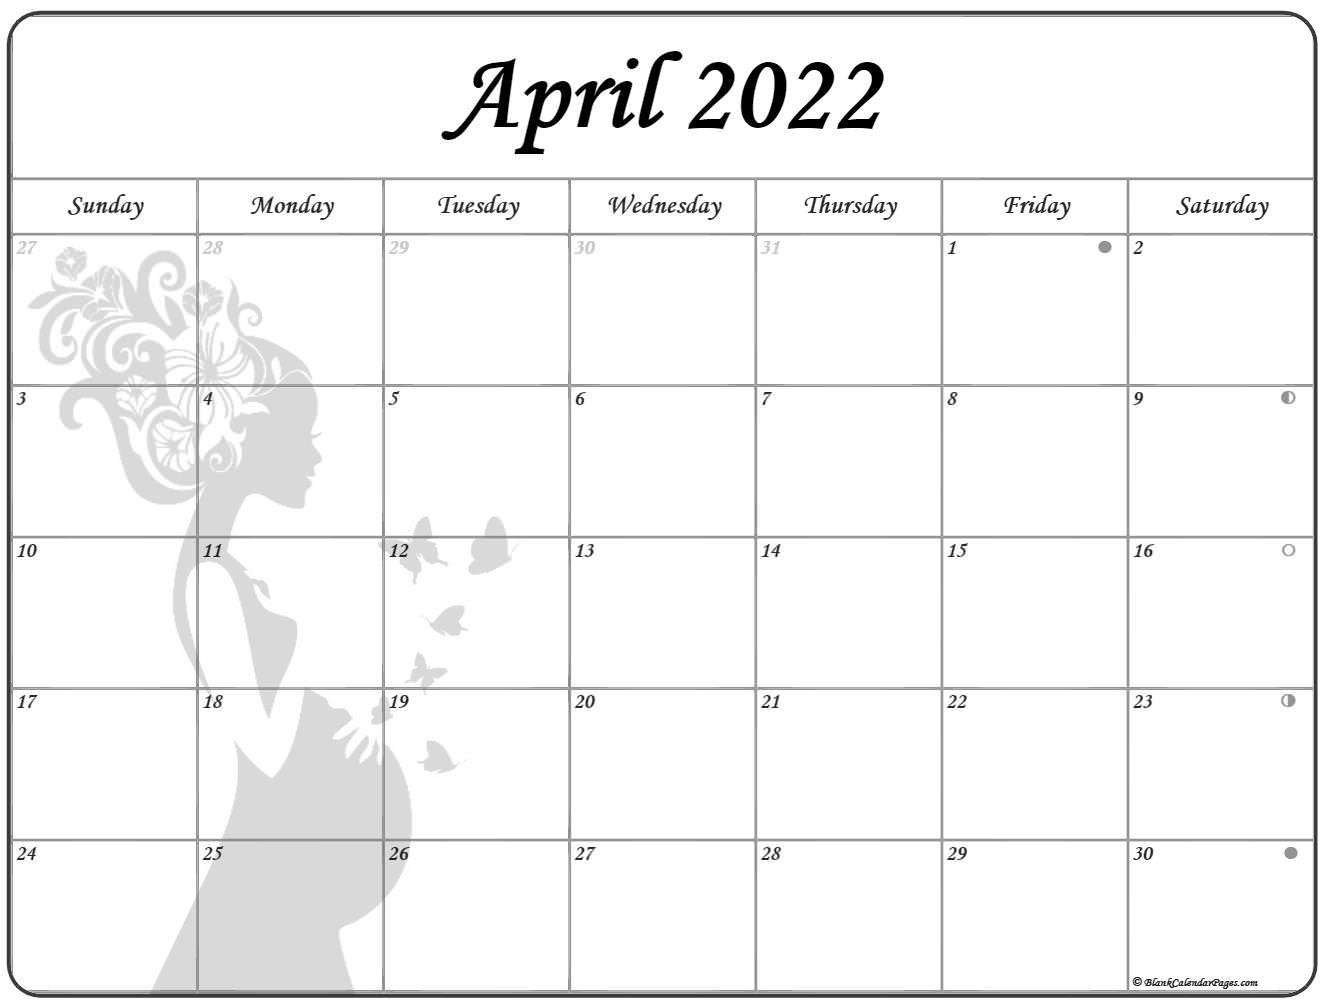 April 2022 Pregnancy Calendar | Fertility Calendar pertaining to April 2022 Calendar Printable Photo